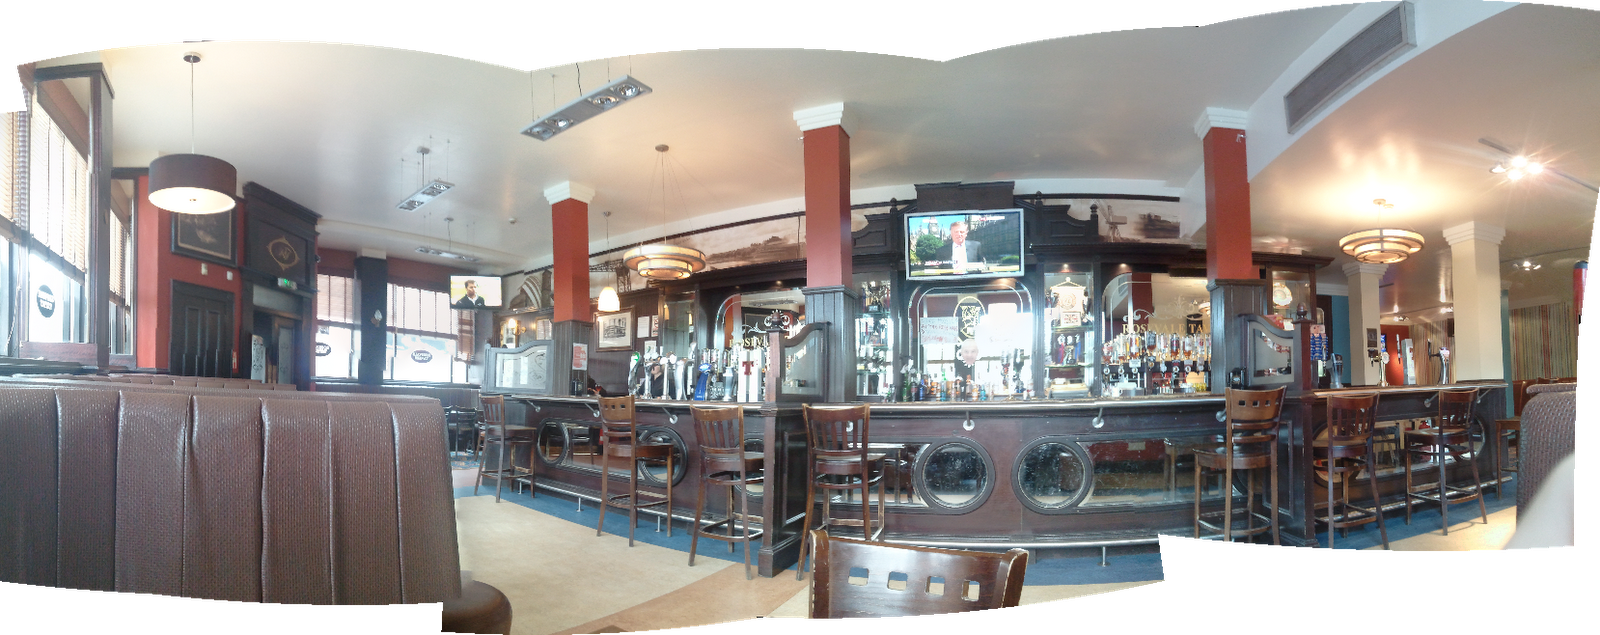 Rosevale Tavern, Glasgow